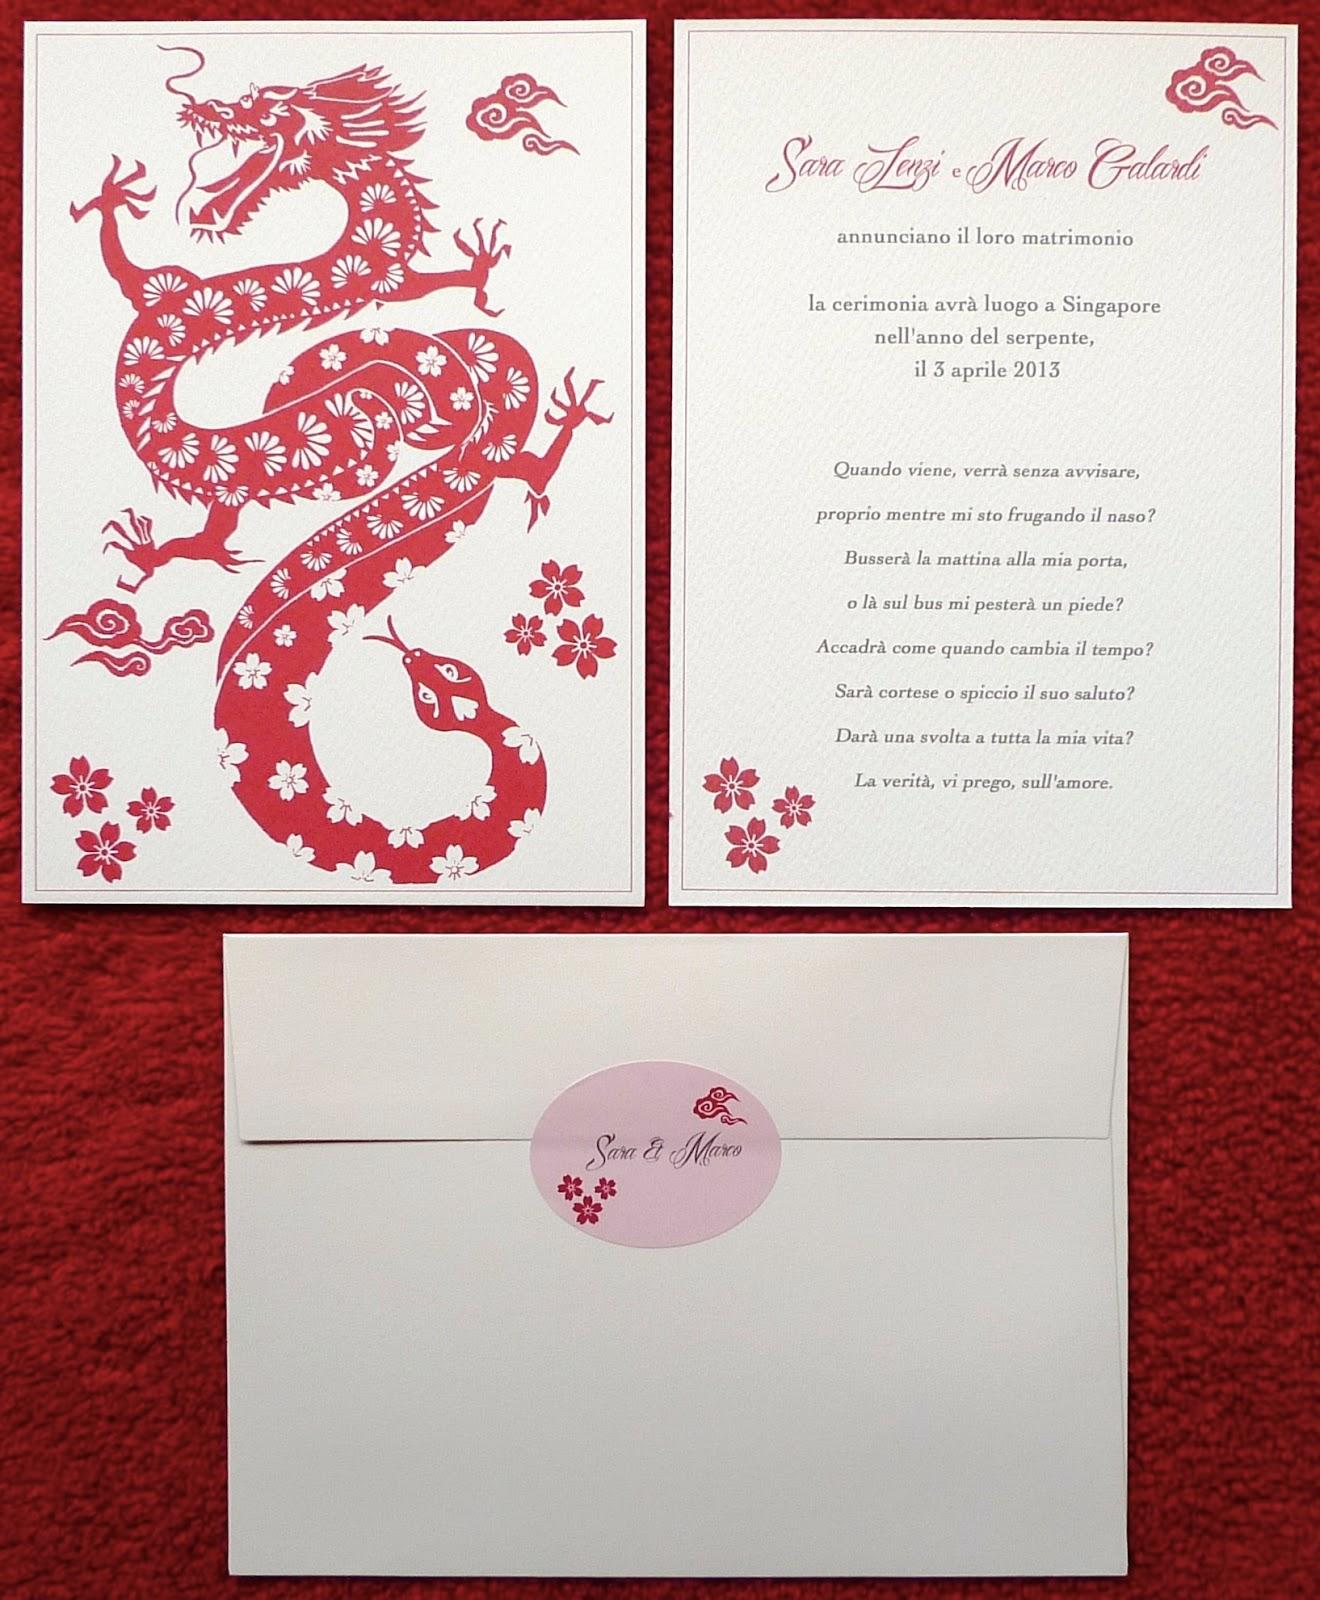 The best wedding invitation blog: Letterpress wedding invitations ...